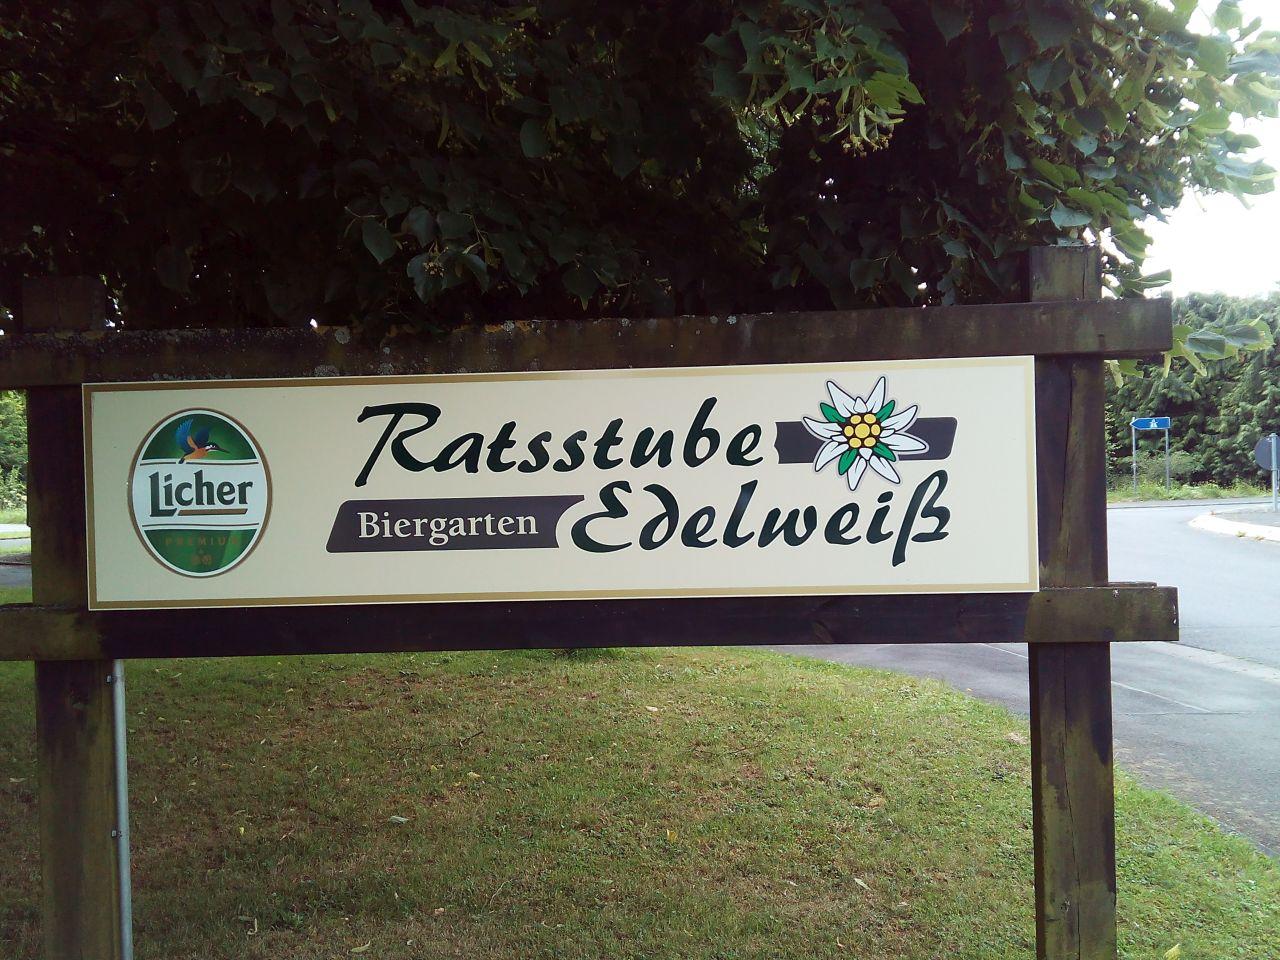 Ratsstube Edelweiß Fernwald